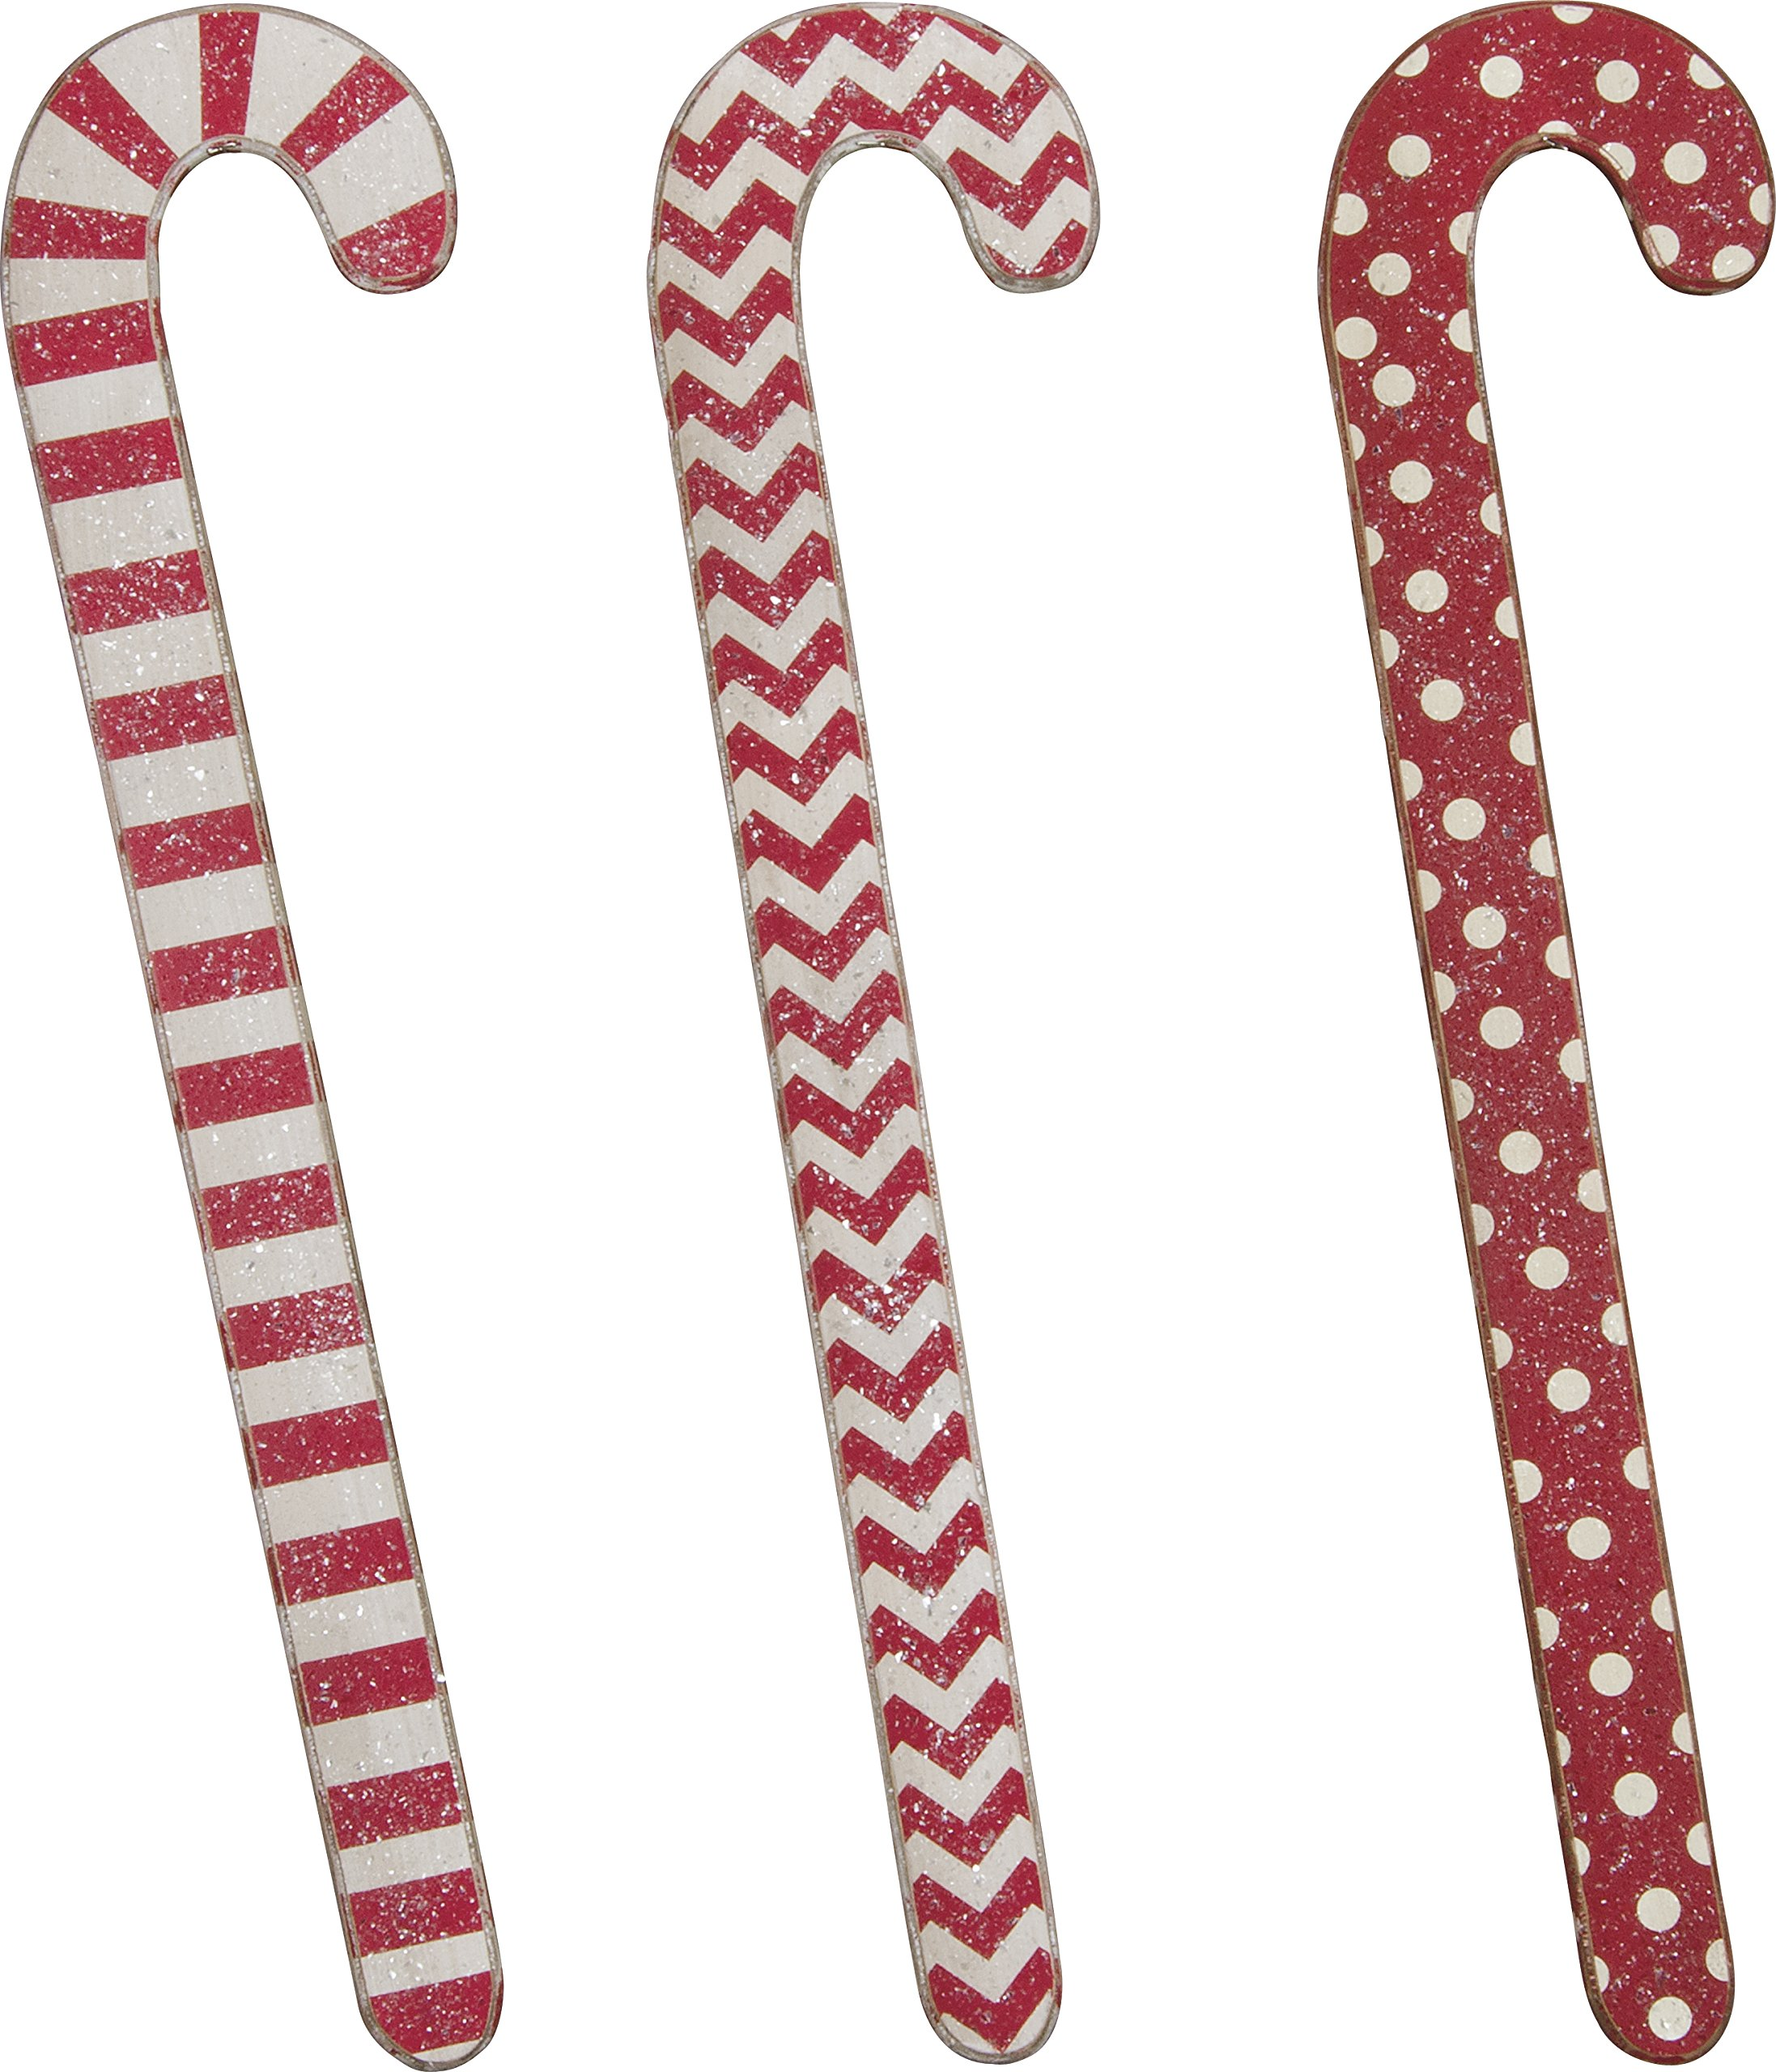 PBK Christmas Decor - Red White Jumbo Wood Candy Canes 3pc